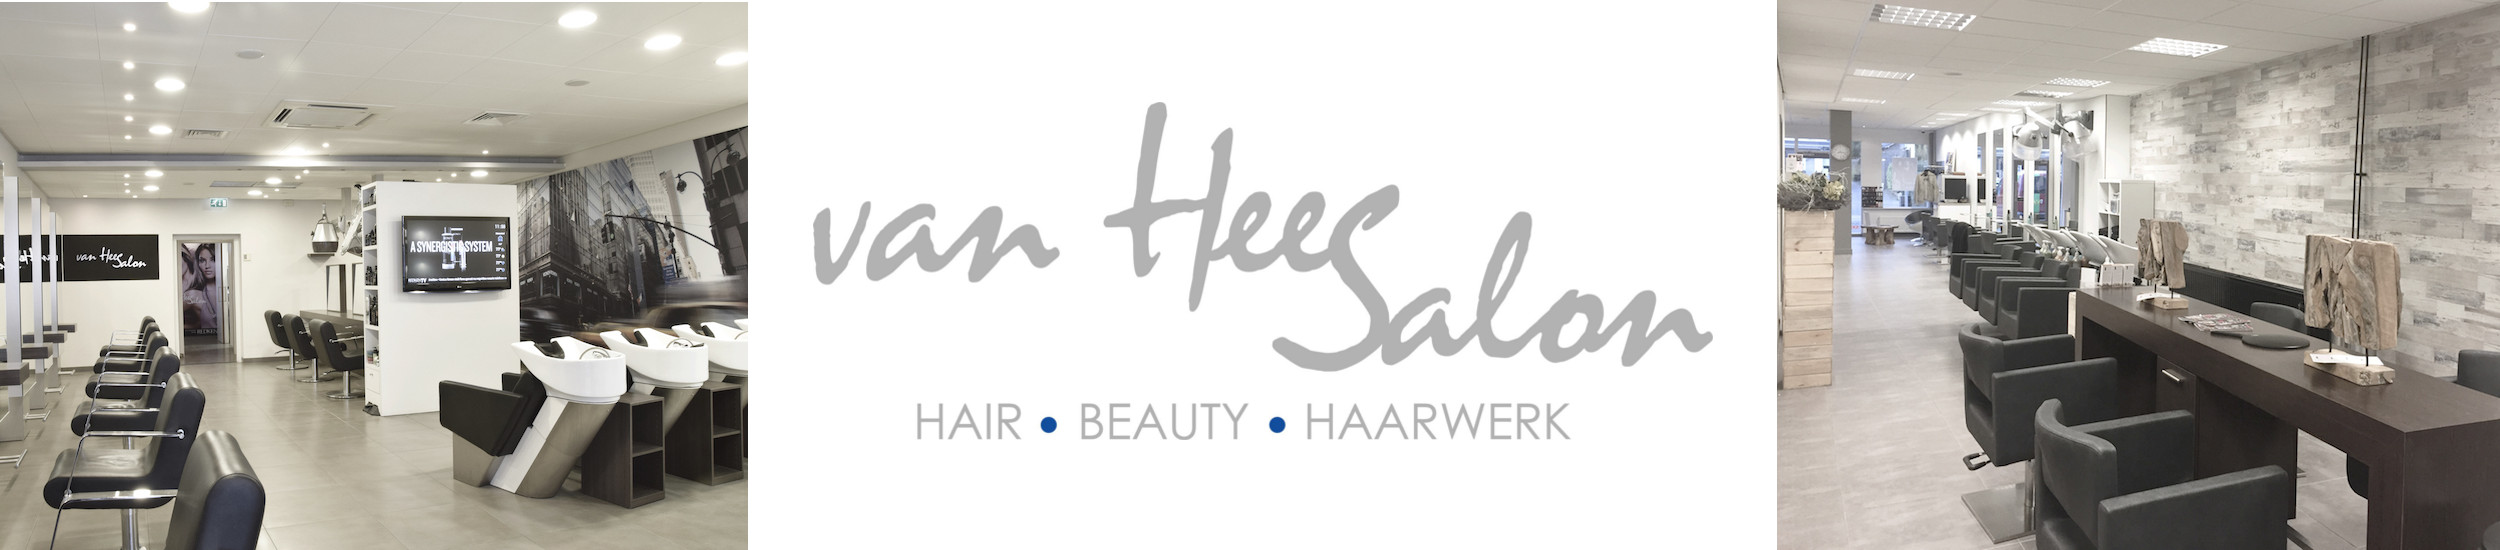 van Hees - Hair Beauty Haarwerk in Rhenen en Leersum